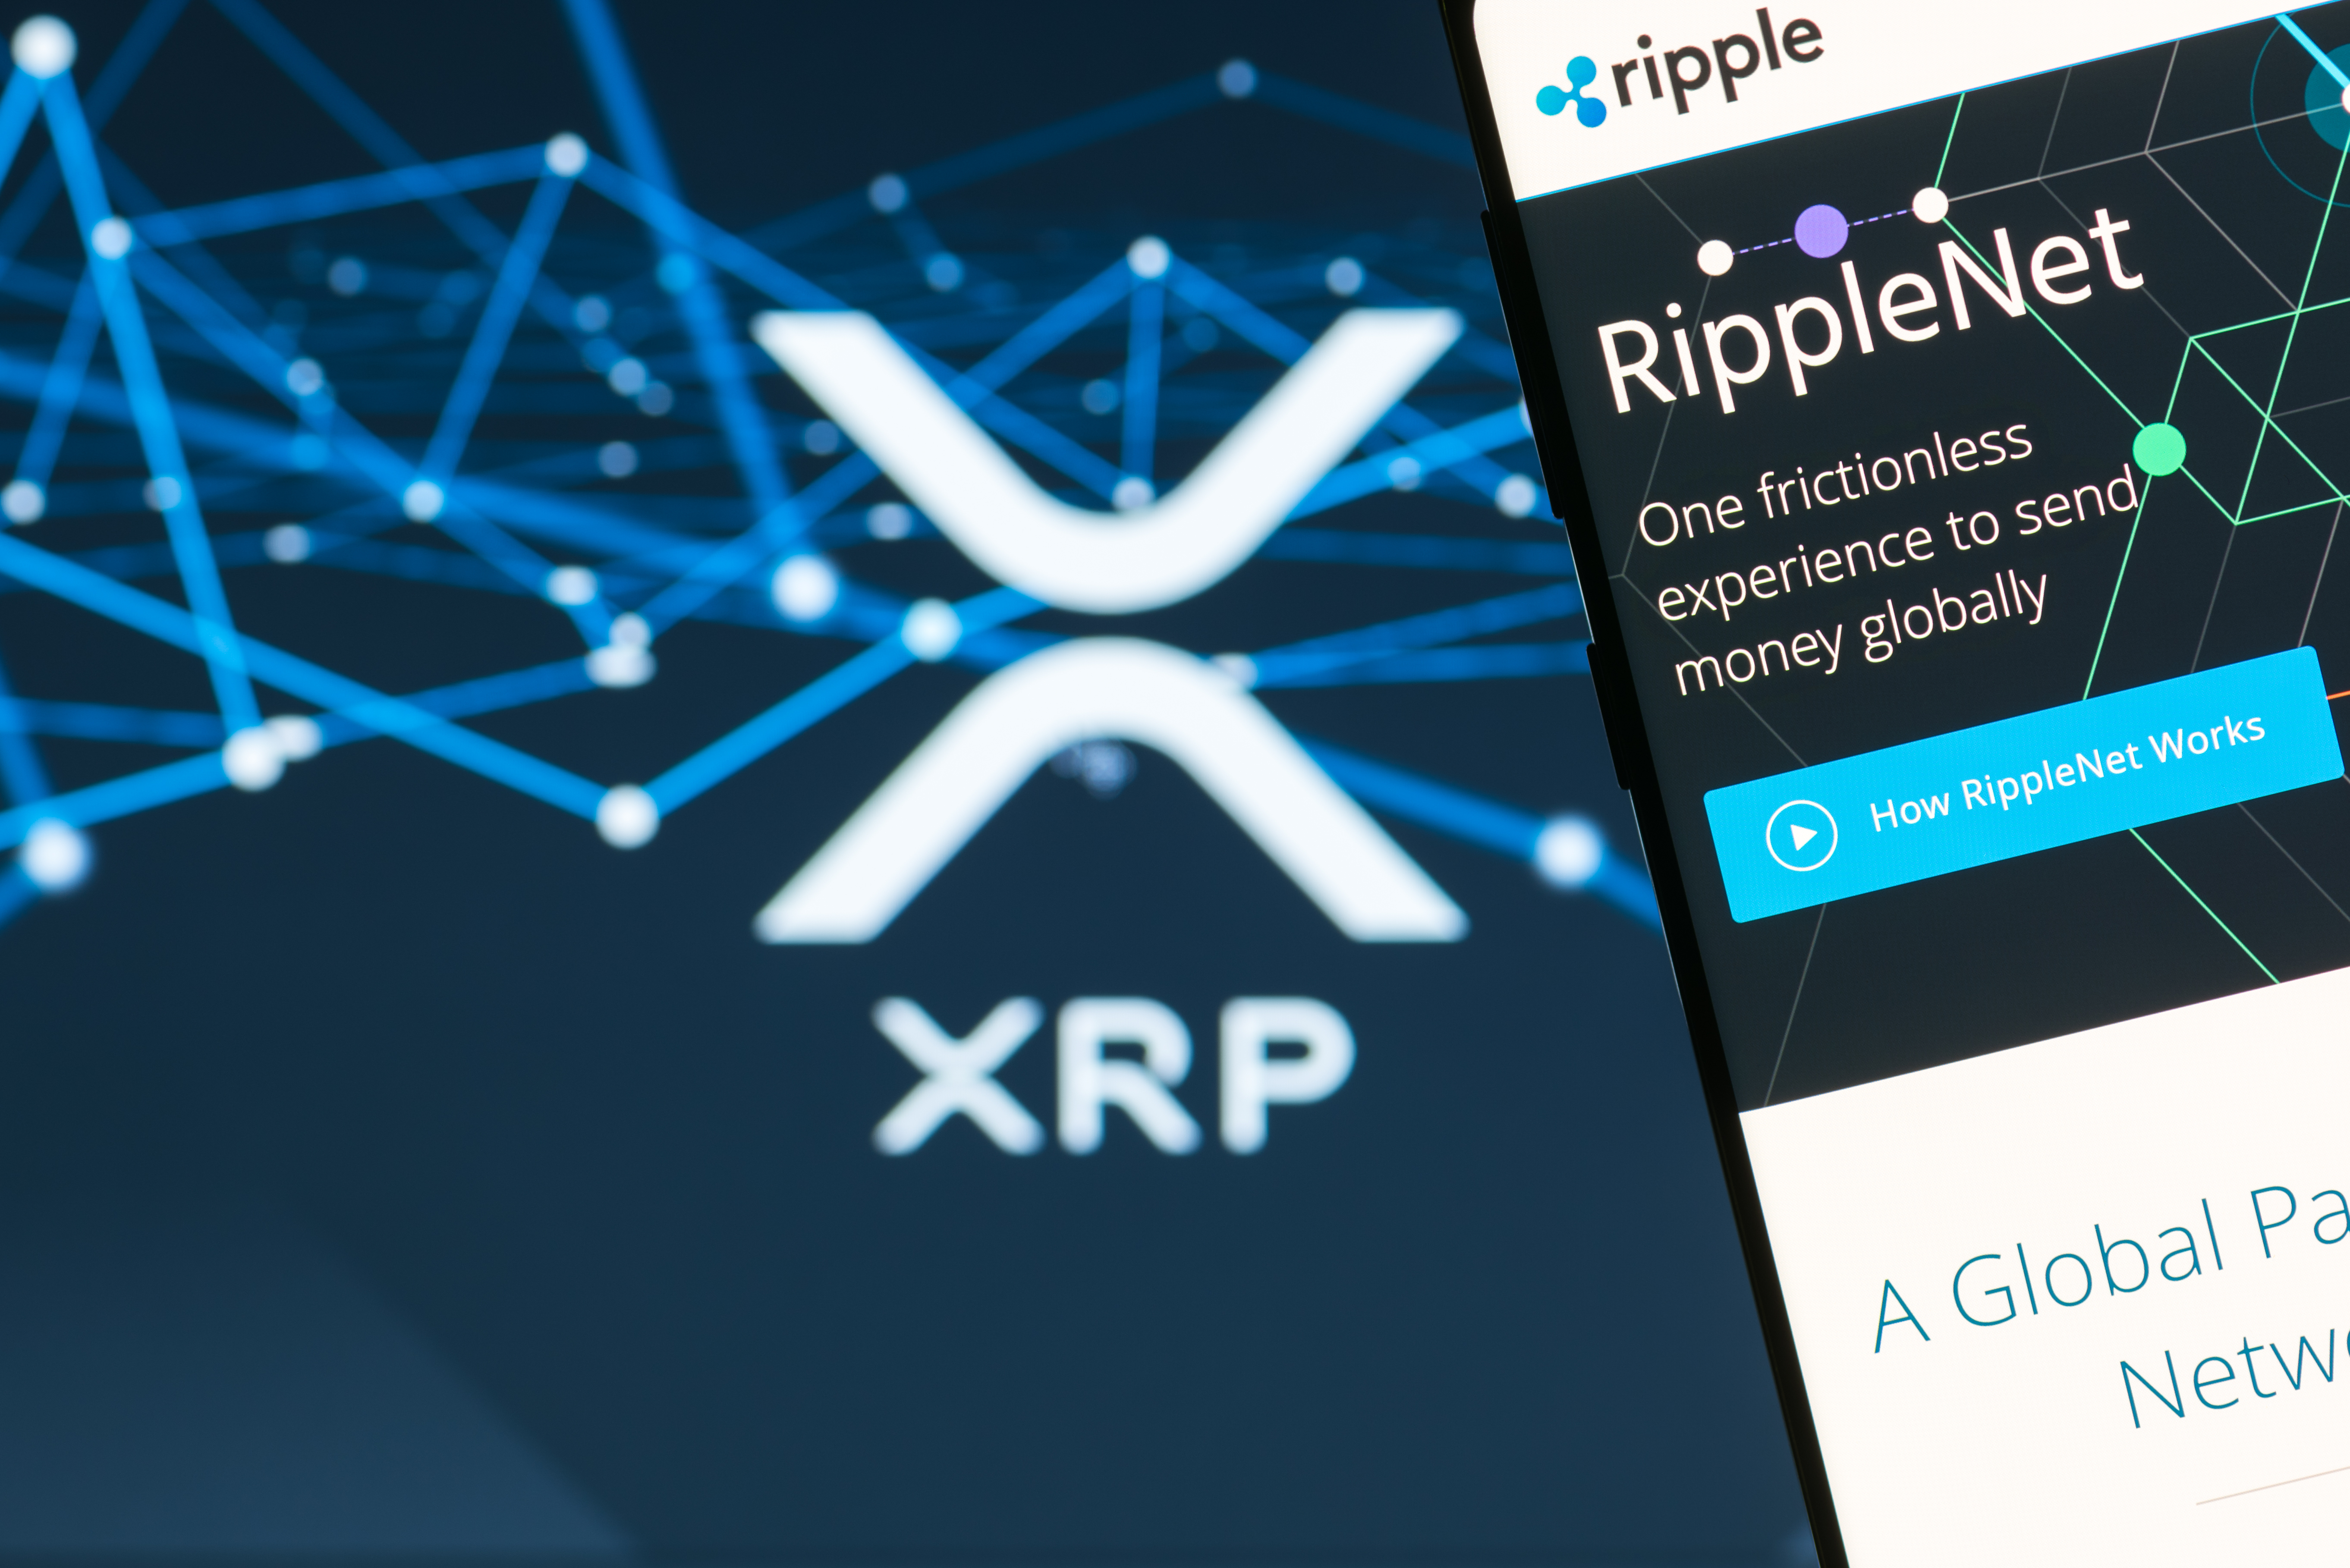 RippleXRP